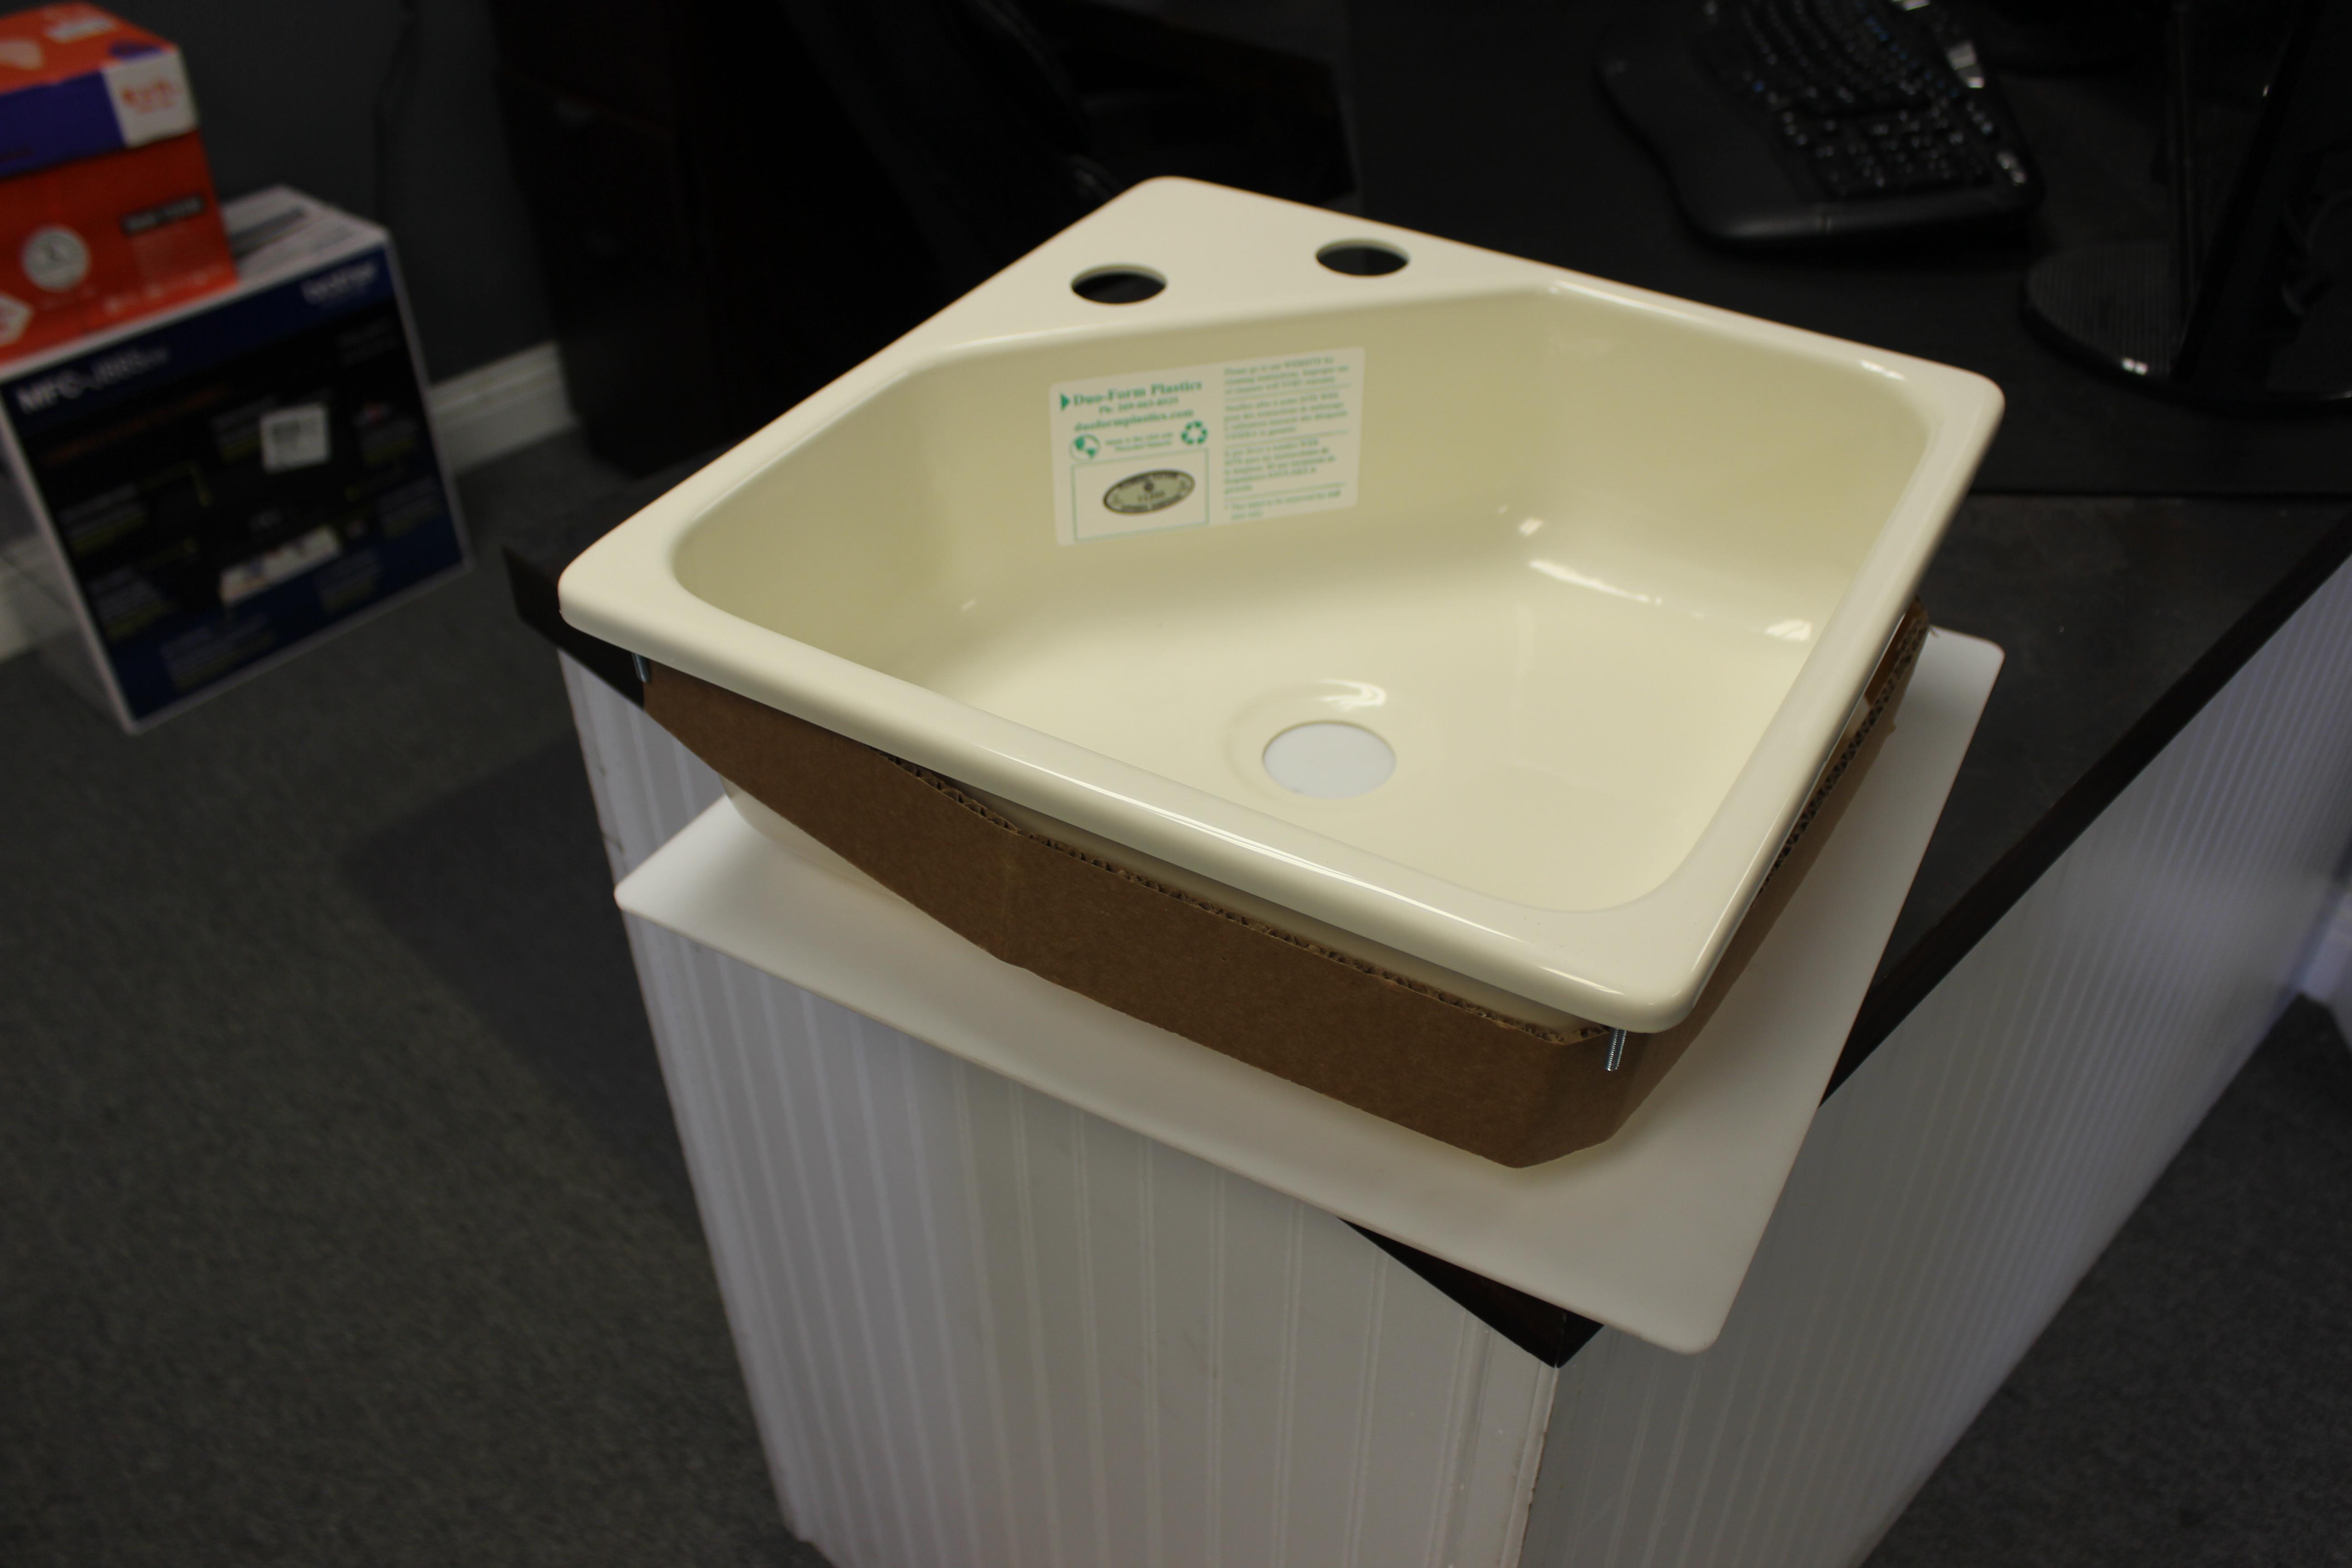 15 Quot X 15 Quot Acrylic Utility Sink With Corner Faucet Mount